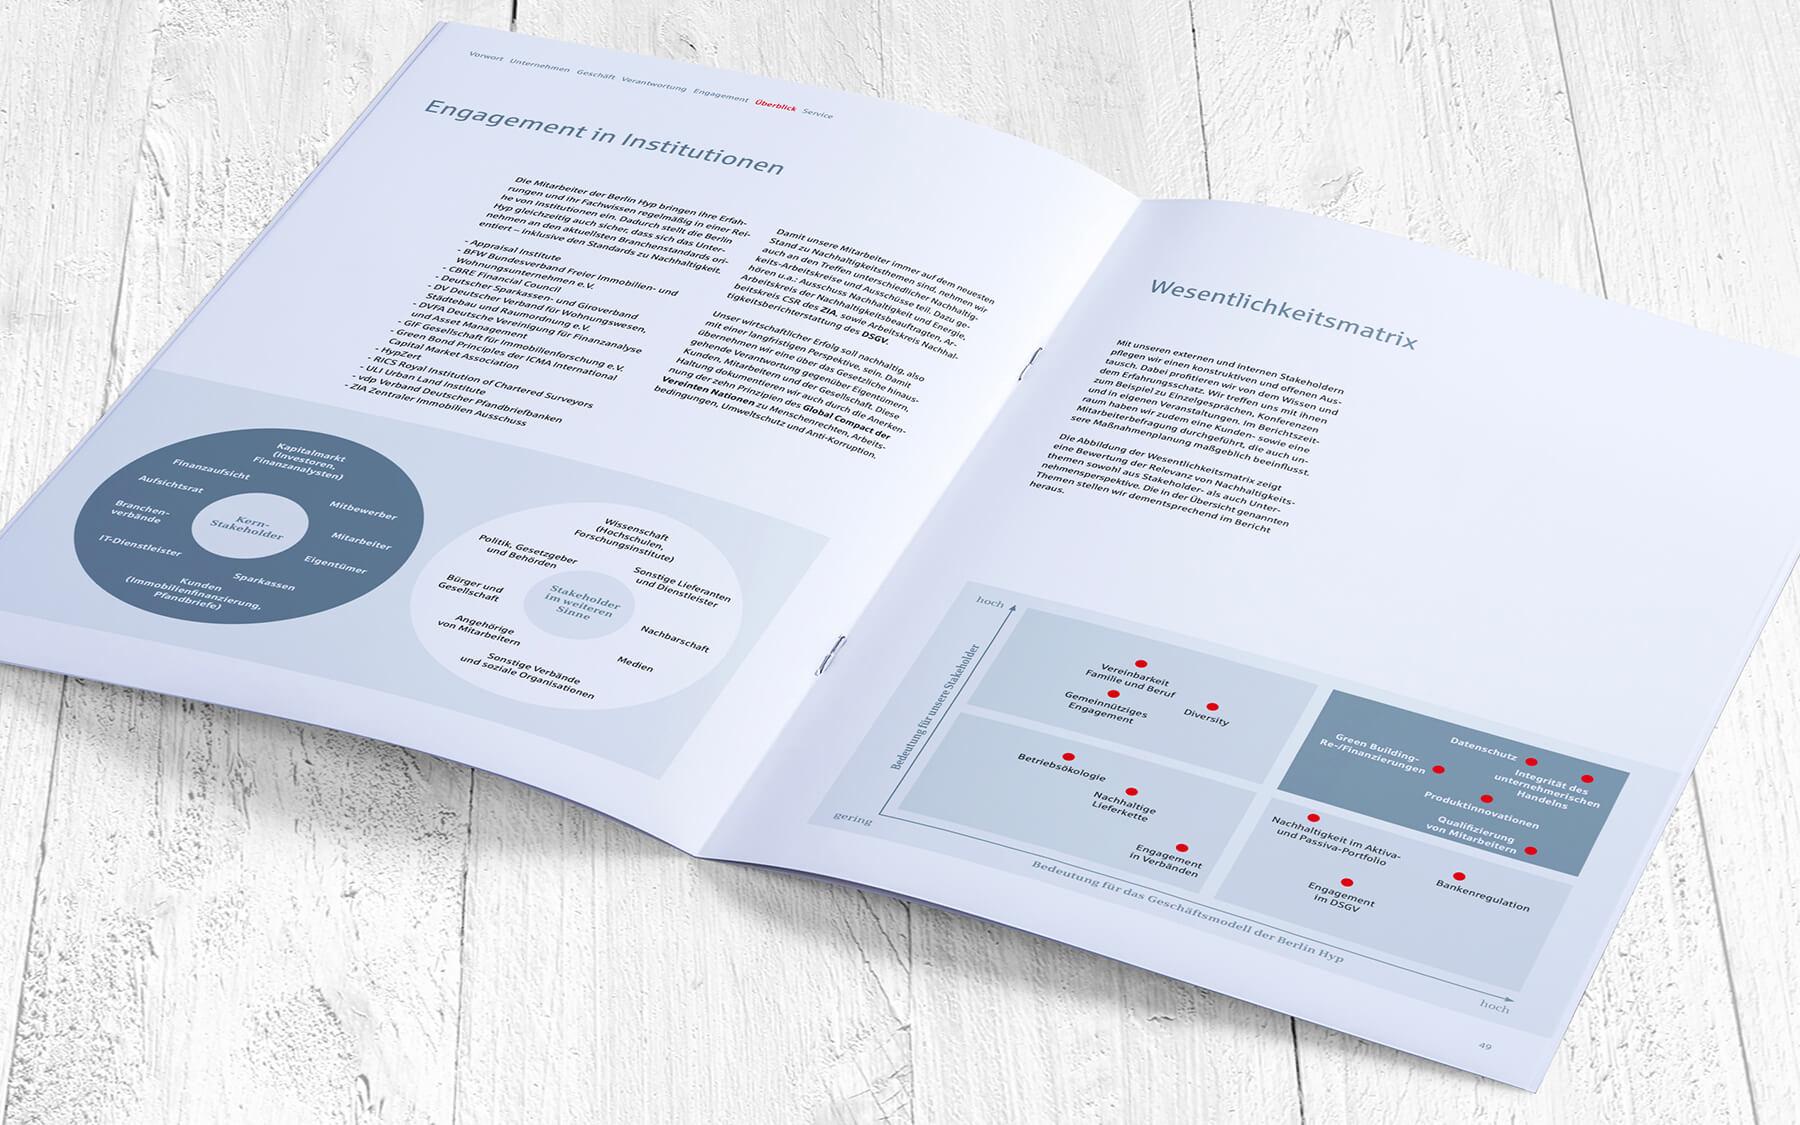 print agentur kataloge werbematerial graphs info grafik stationery plakate kampagnen werbeagentur berlin corporate design